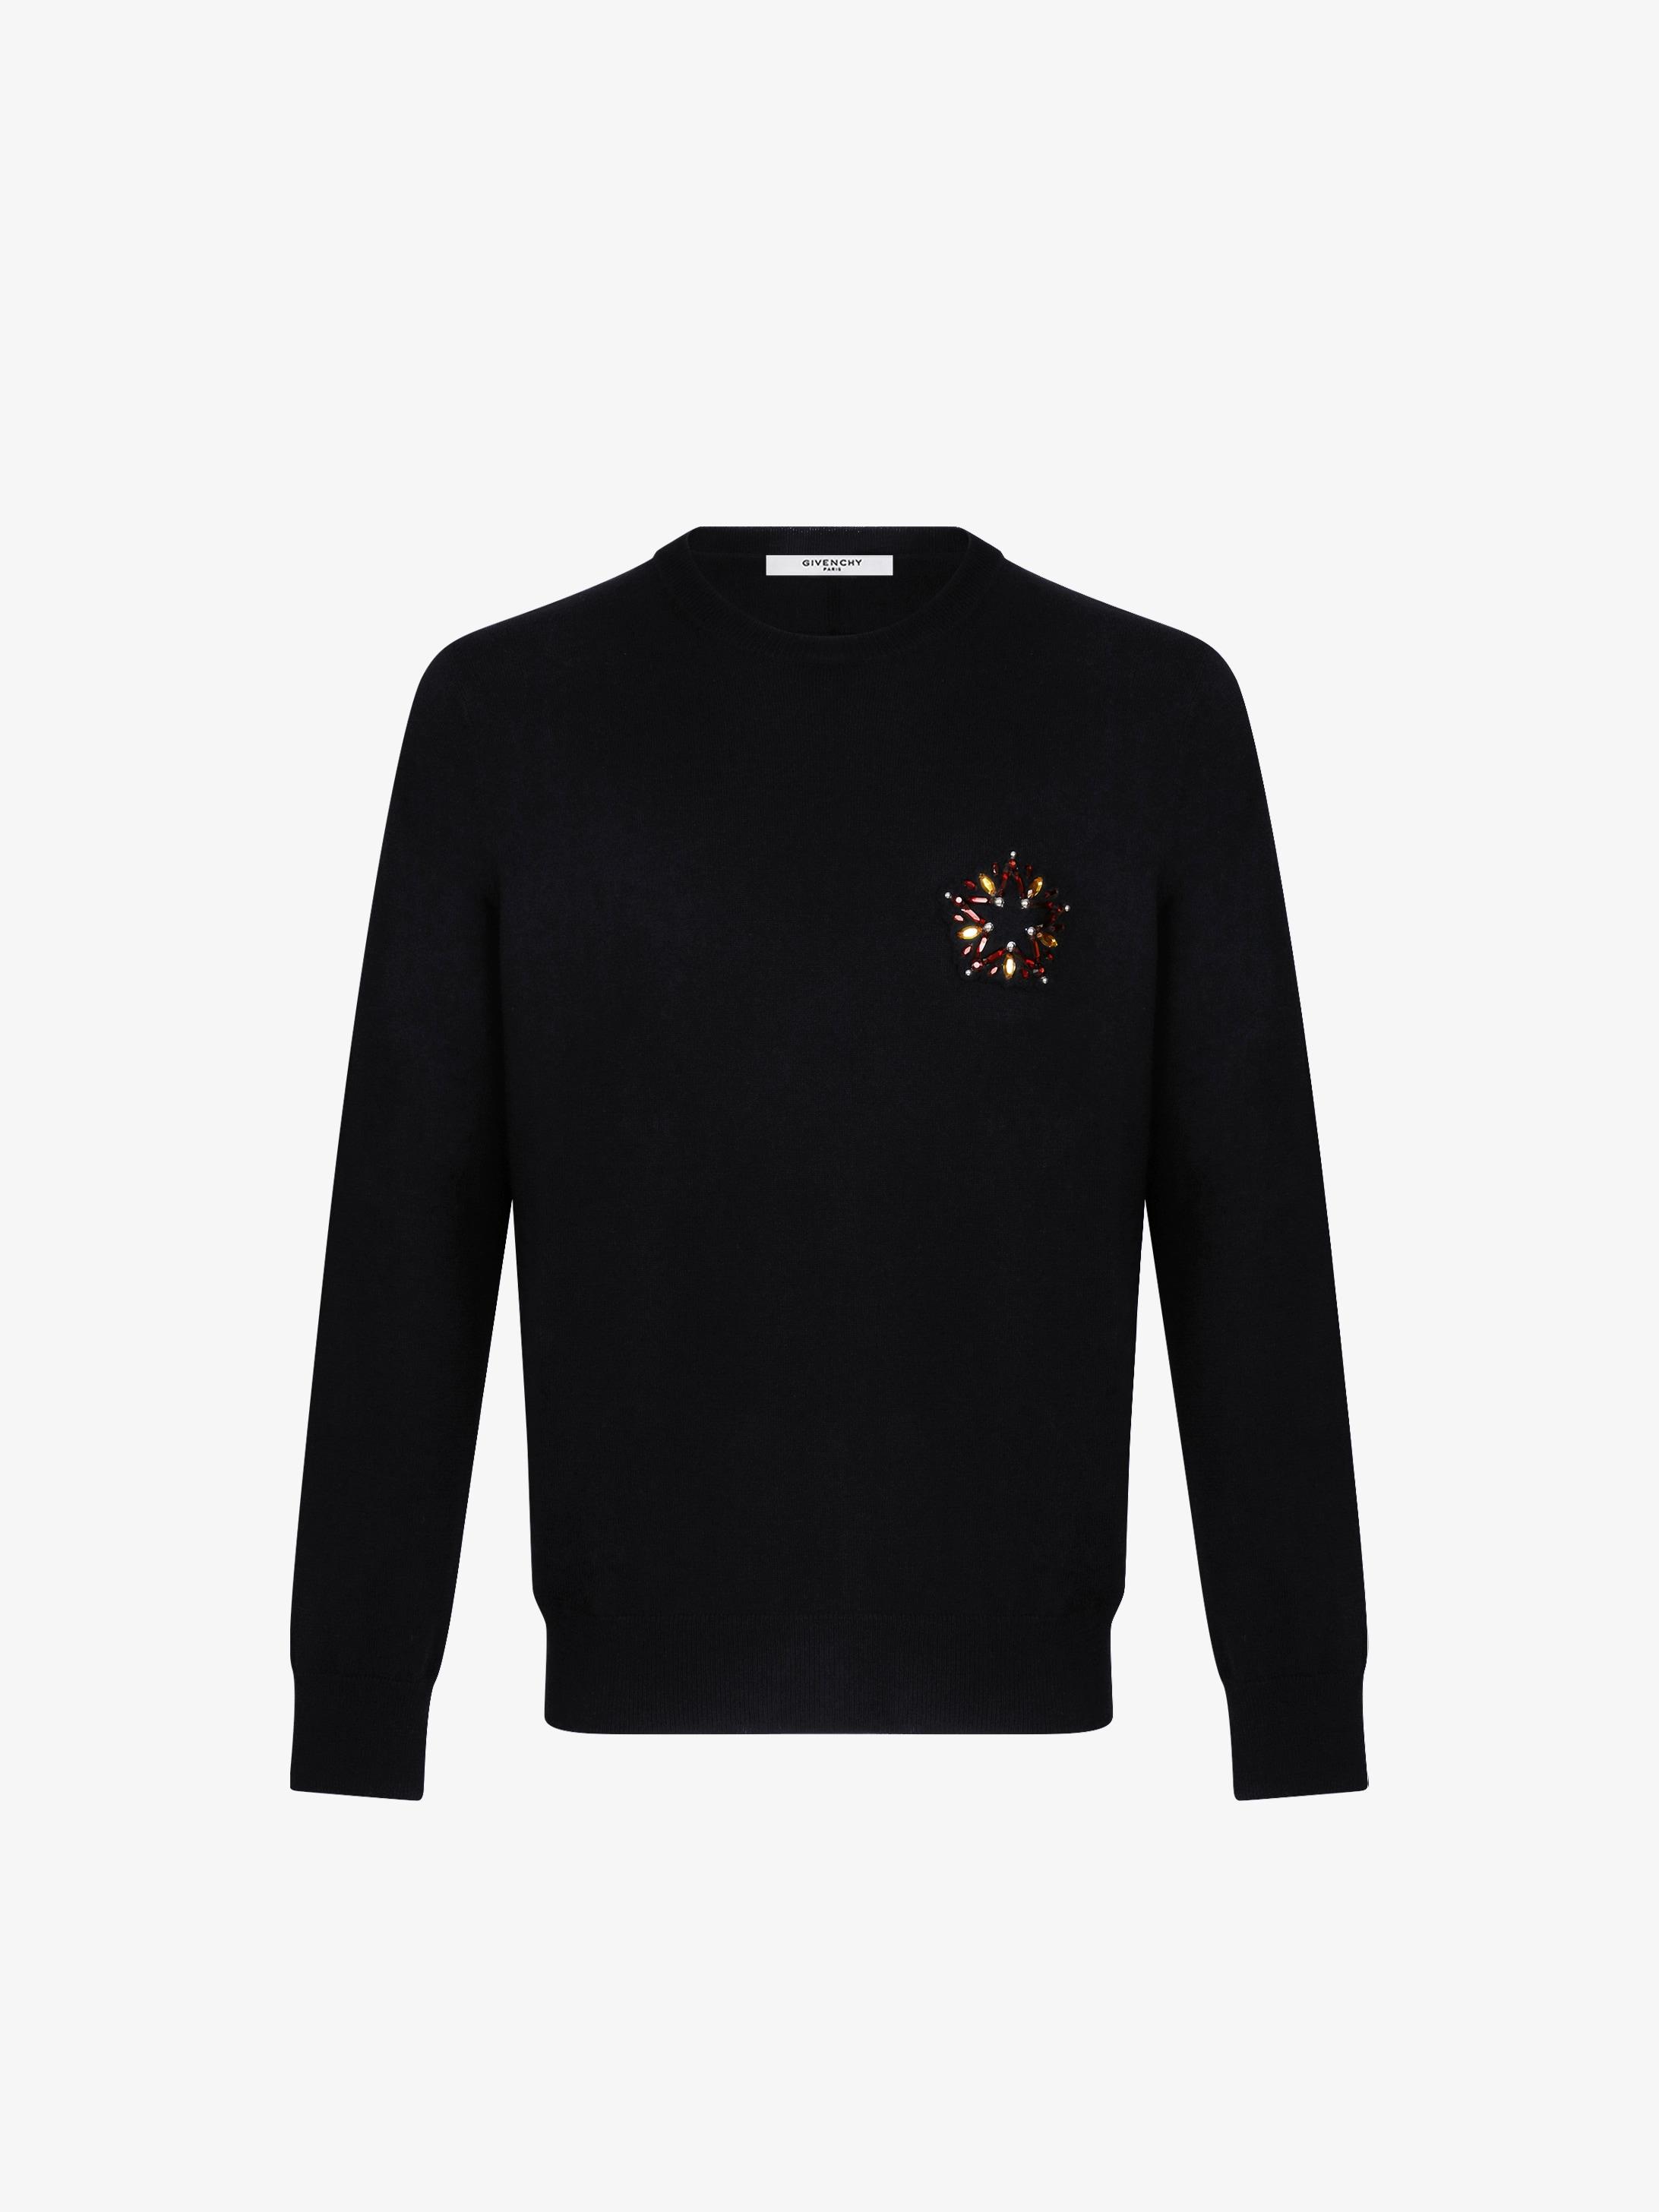 Star embroidered jumper